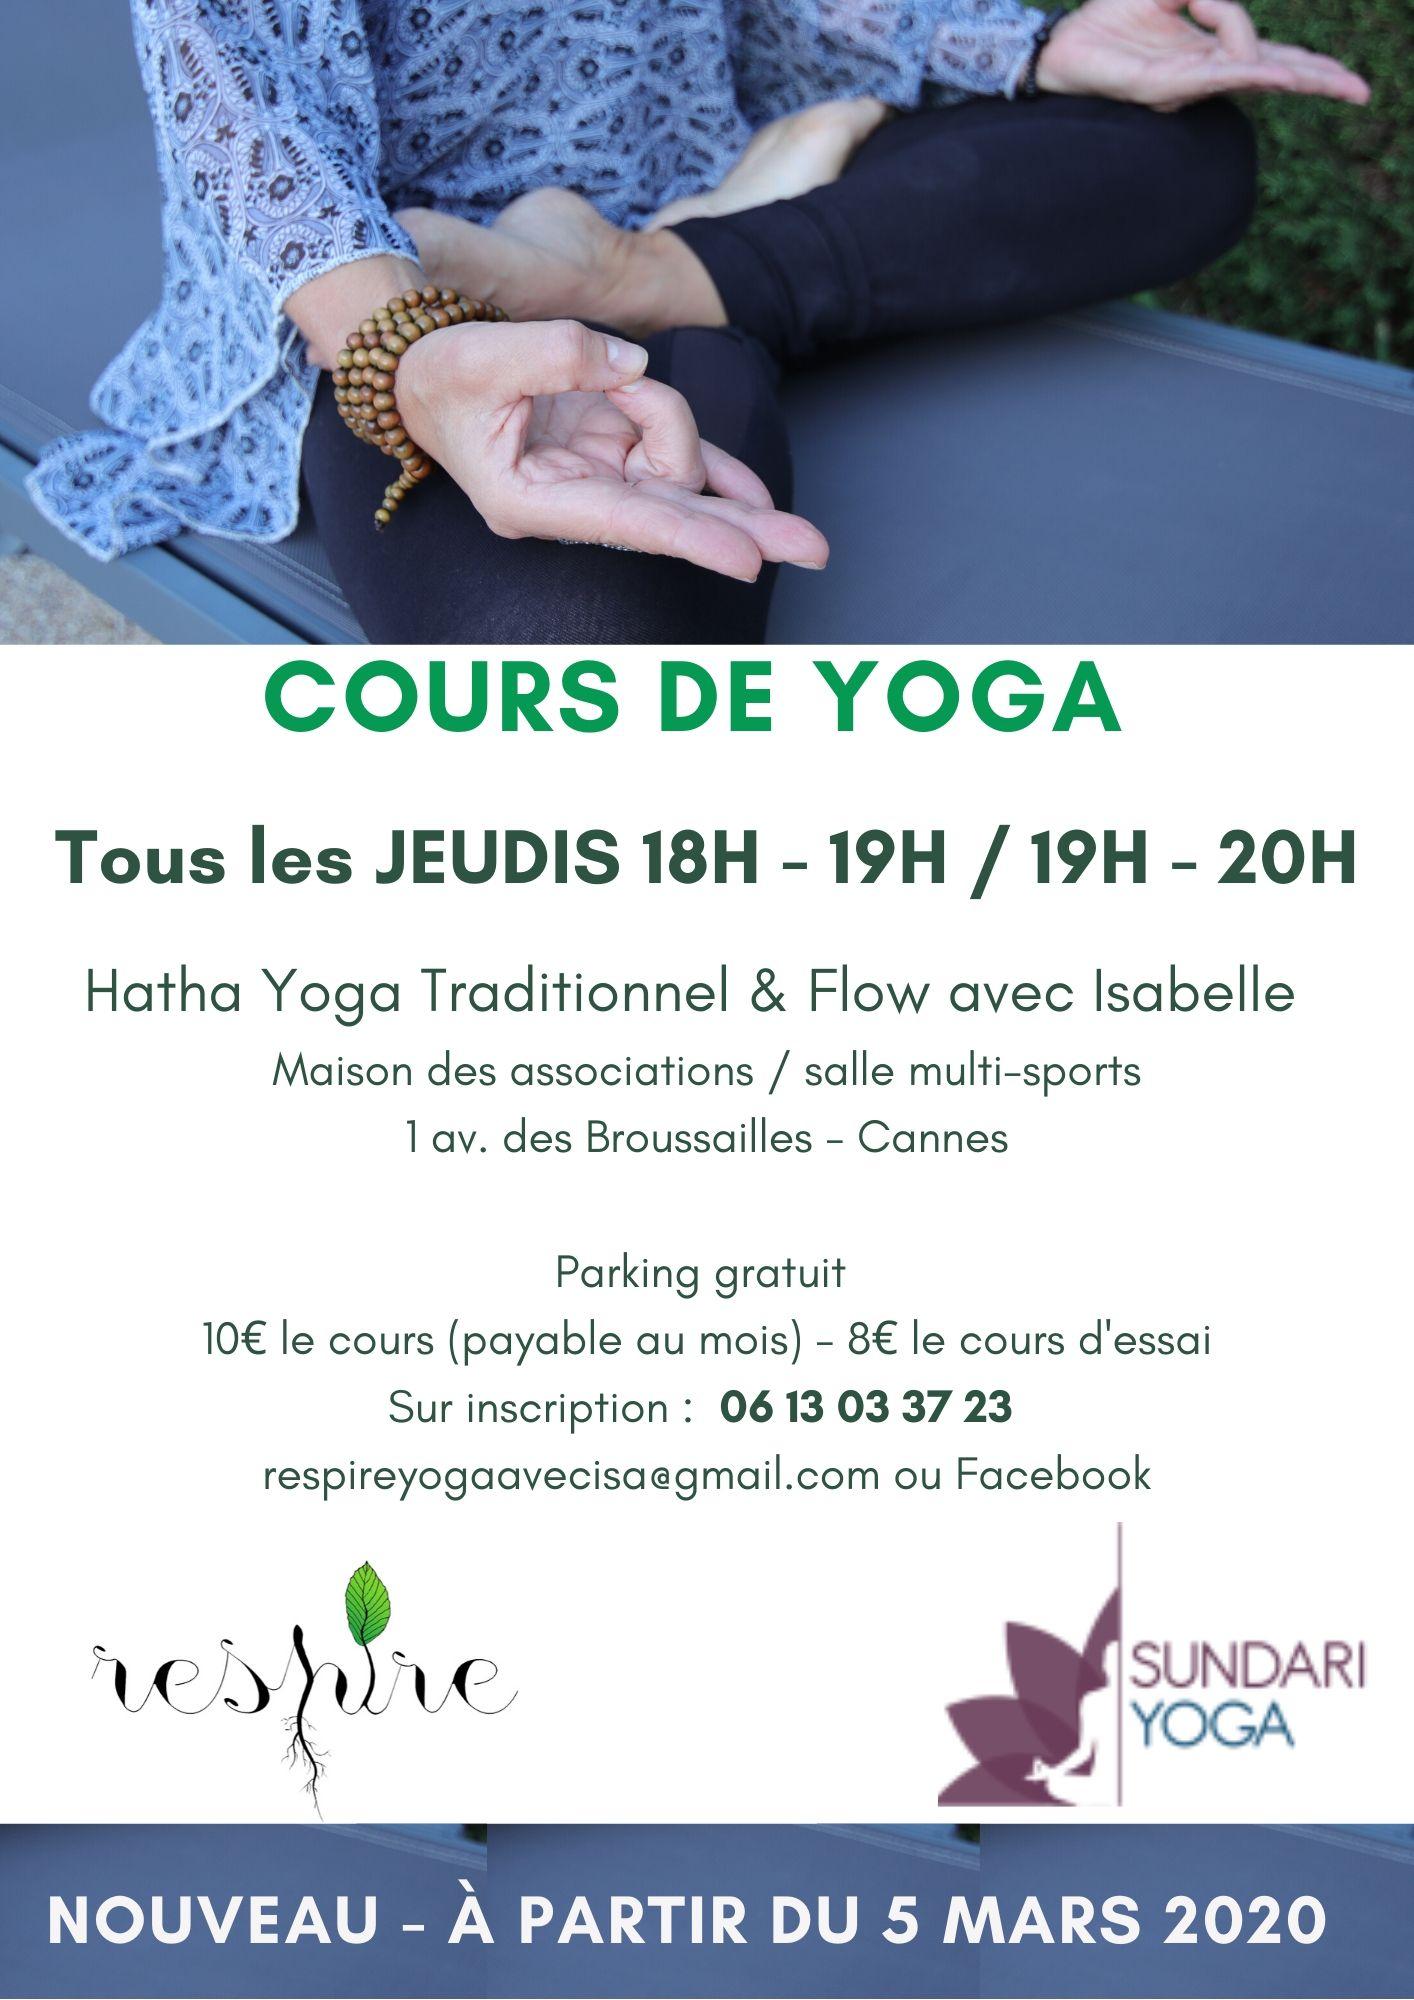 image du professeur de yoga RESPIREYOGAISA